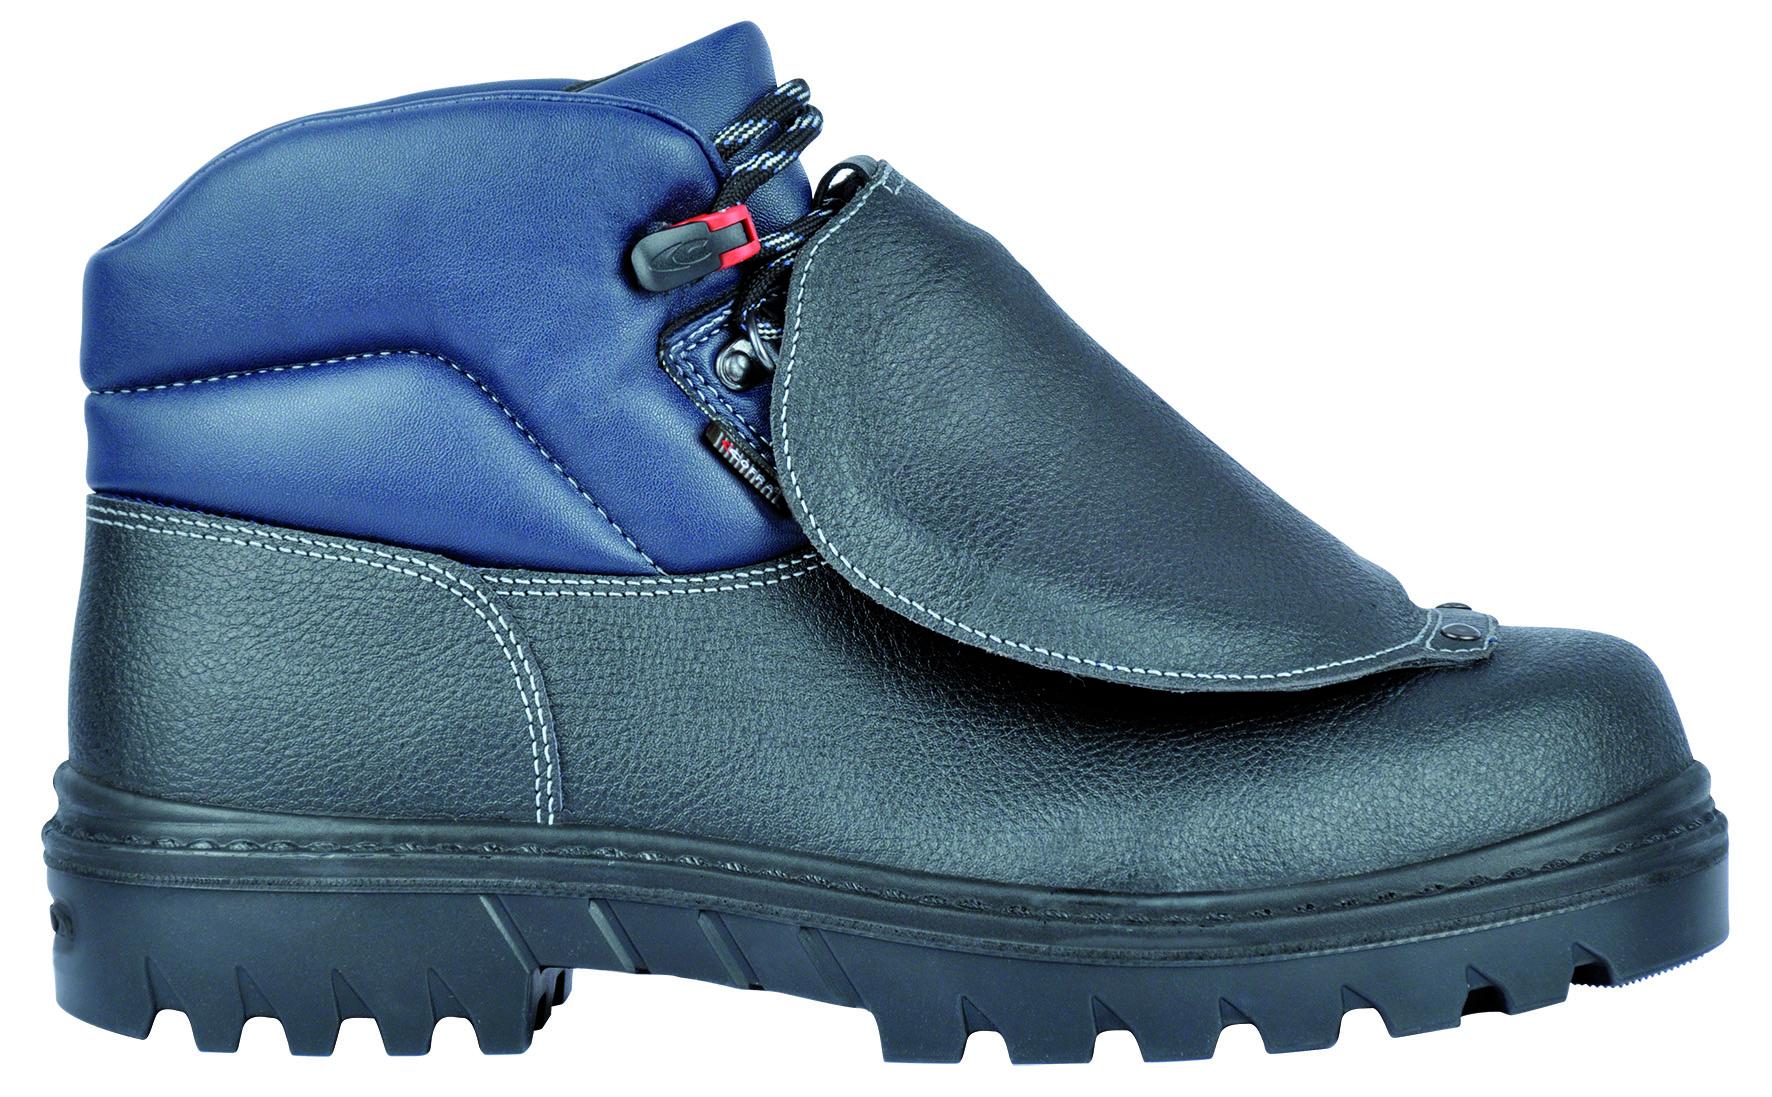 COFRA Spezial Arbeits Berufs Sicherheits Schuhe, PROTECTOR BIS S3 M HRO SRC